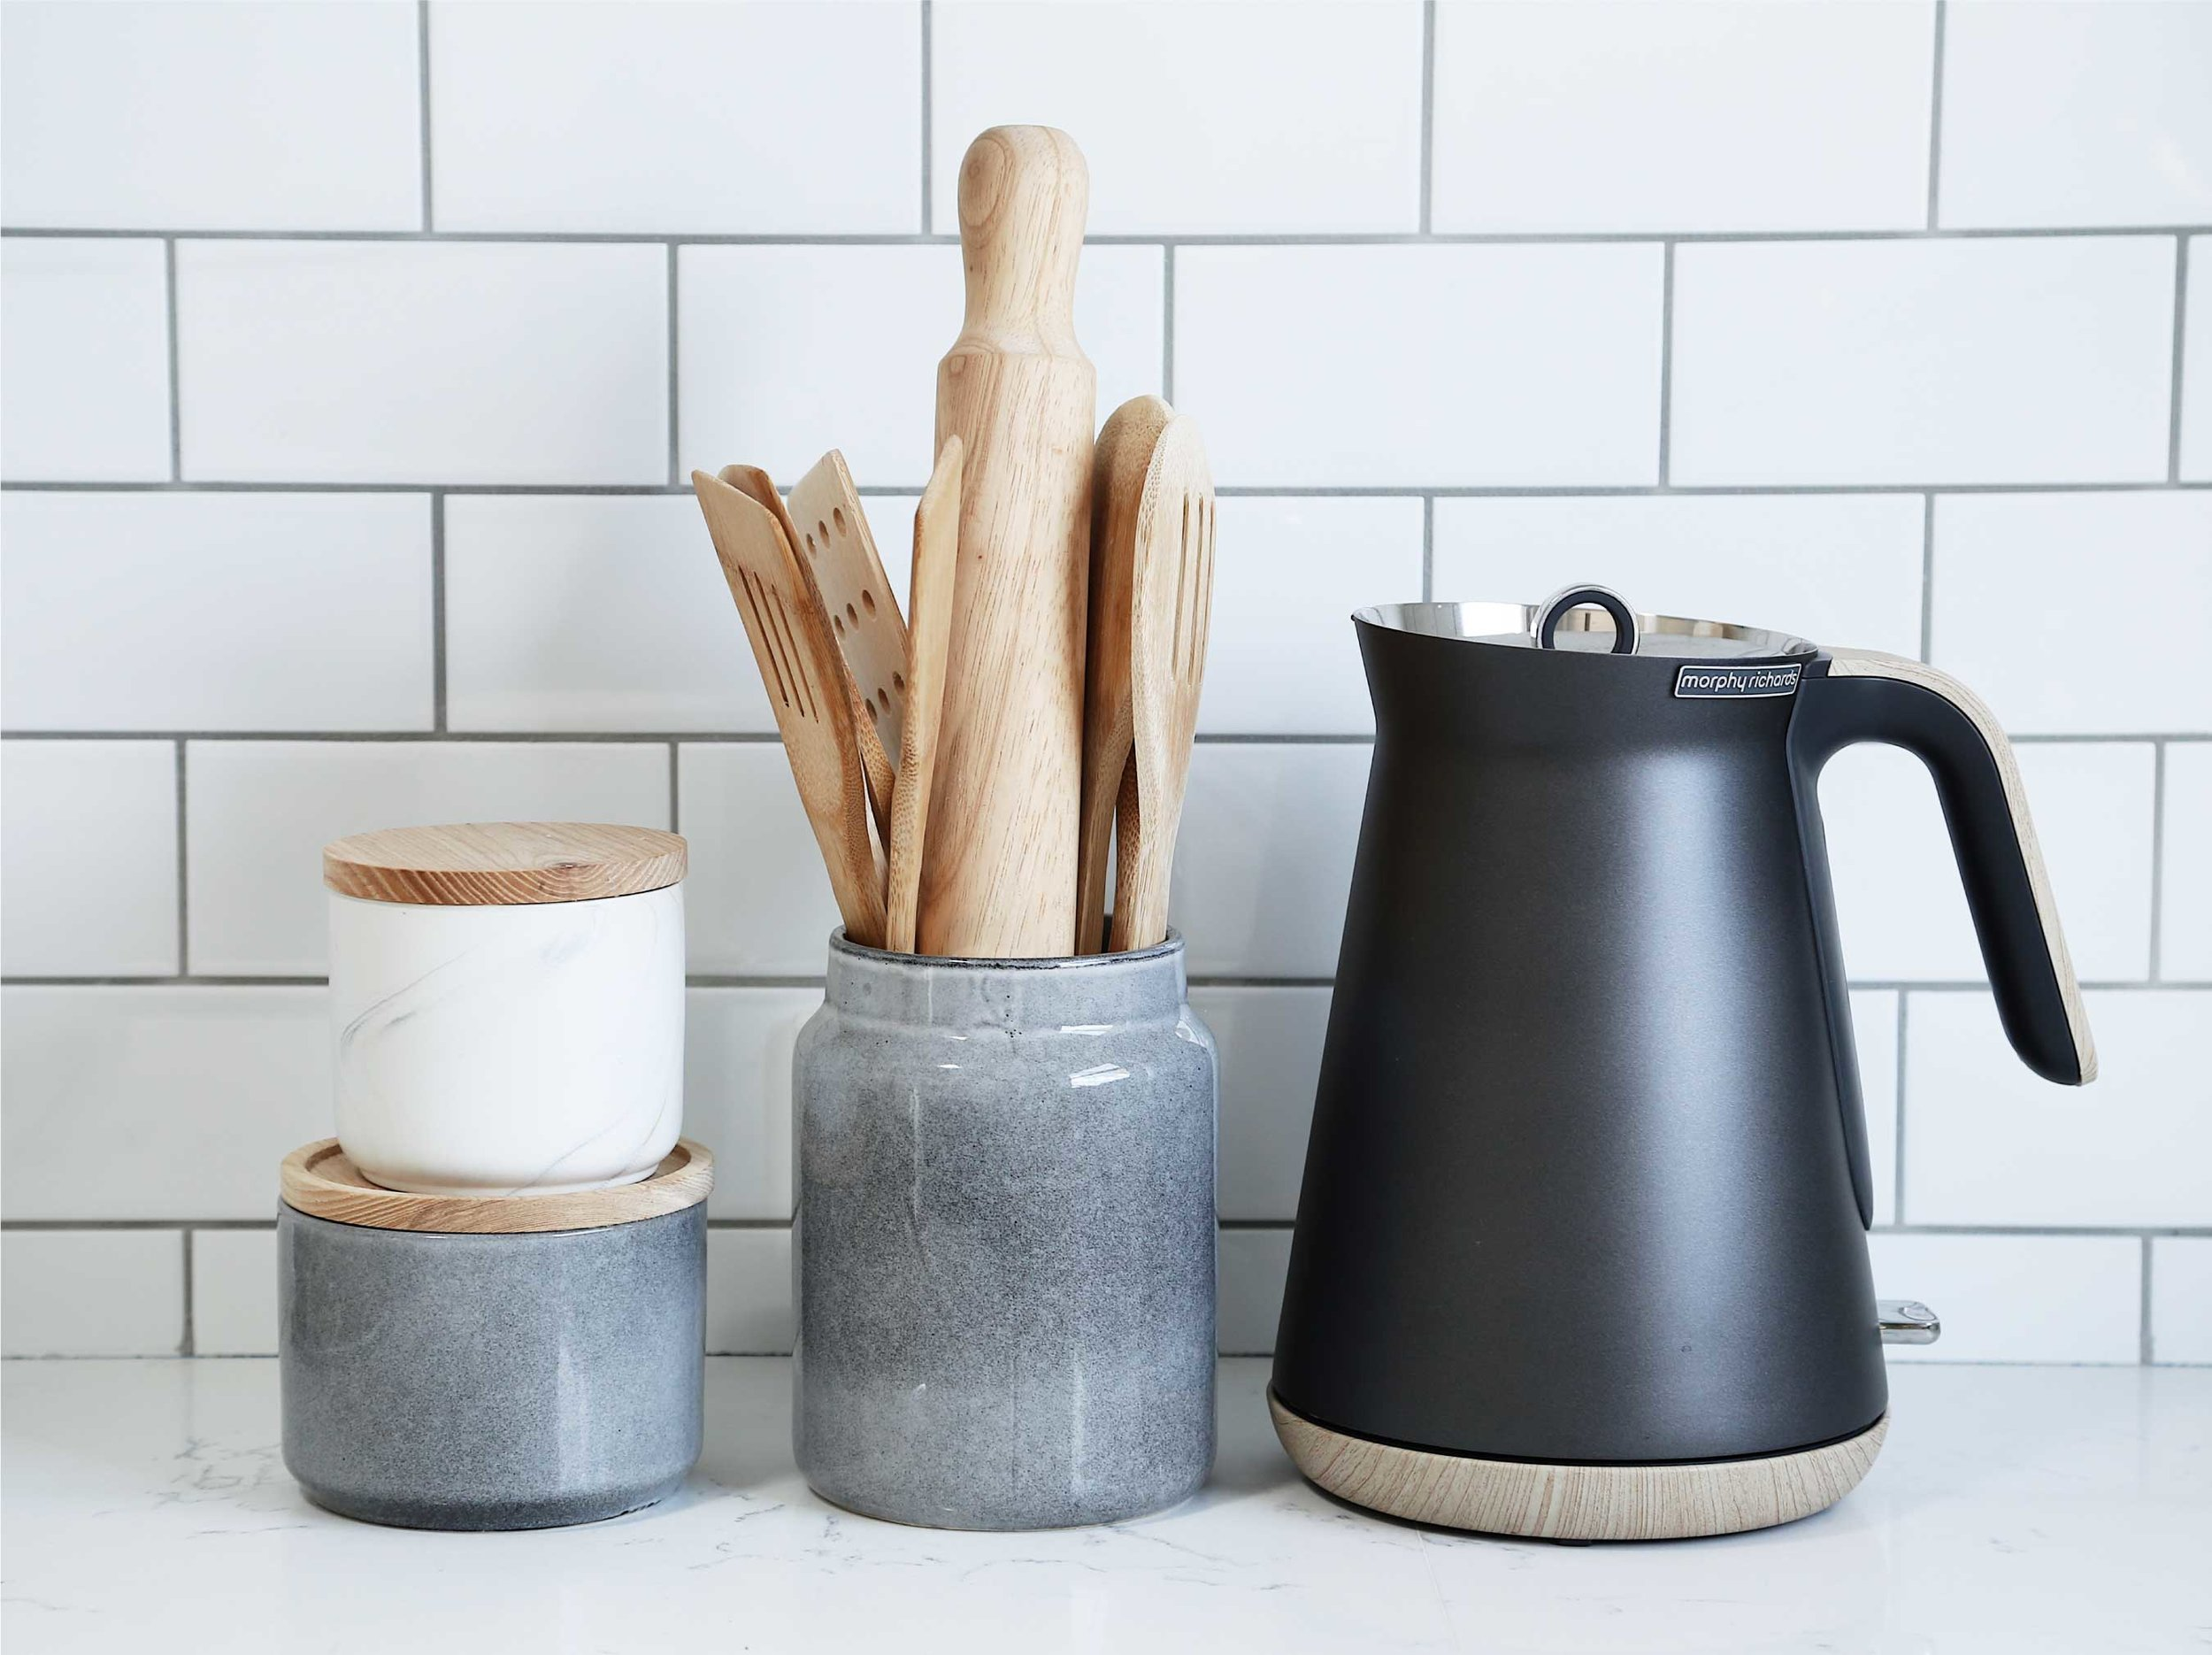 Magno Kitchens www.magnokitchens.com.au  (2).jpg